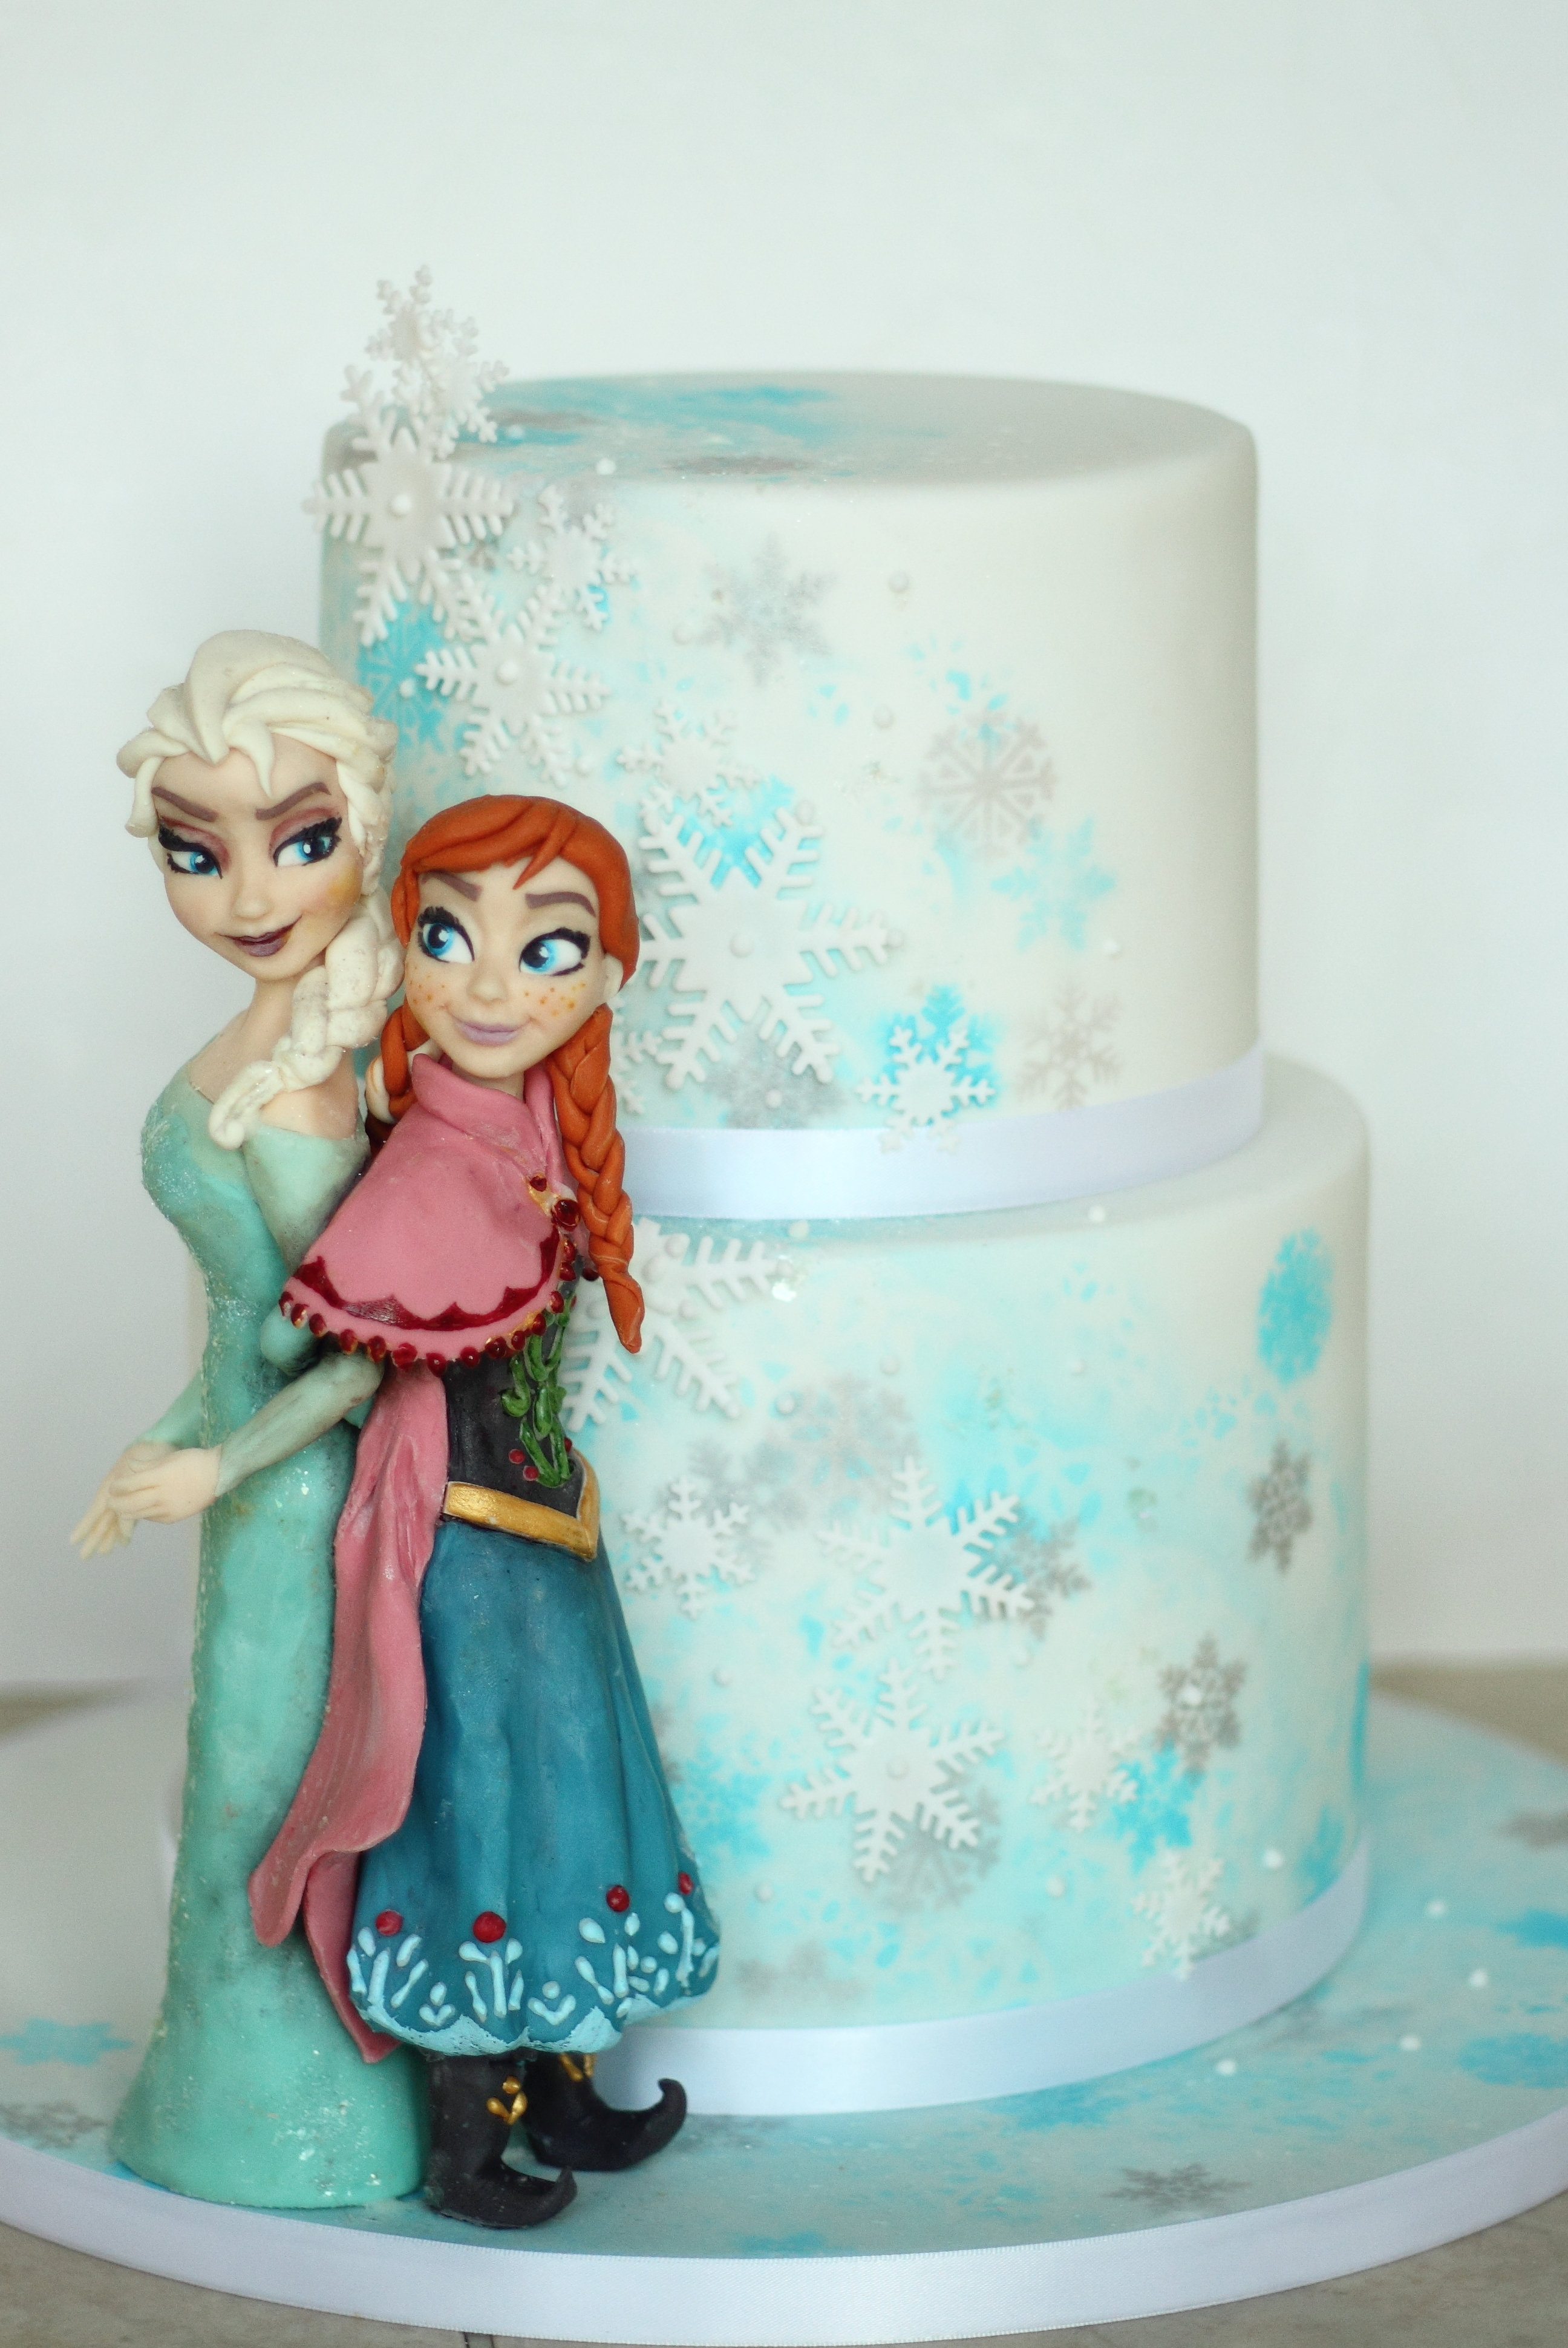 Disneys Frozen Cake Created For Disney Hq In London